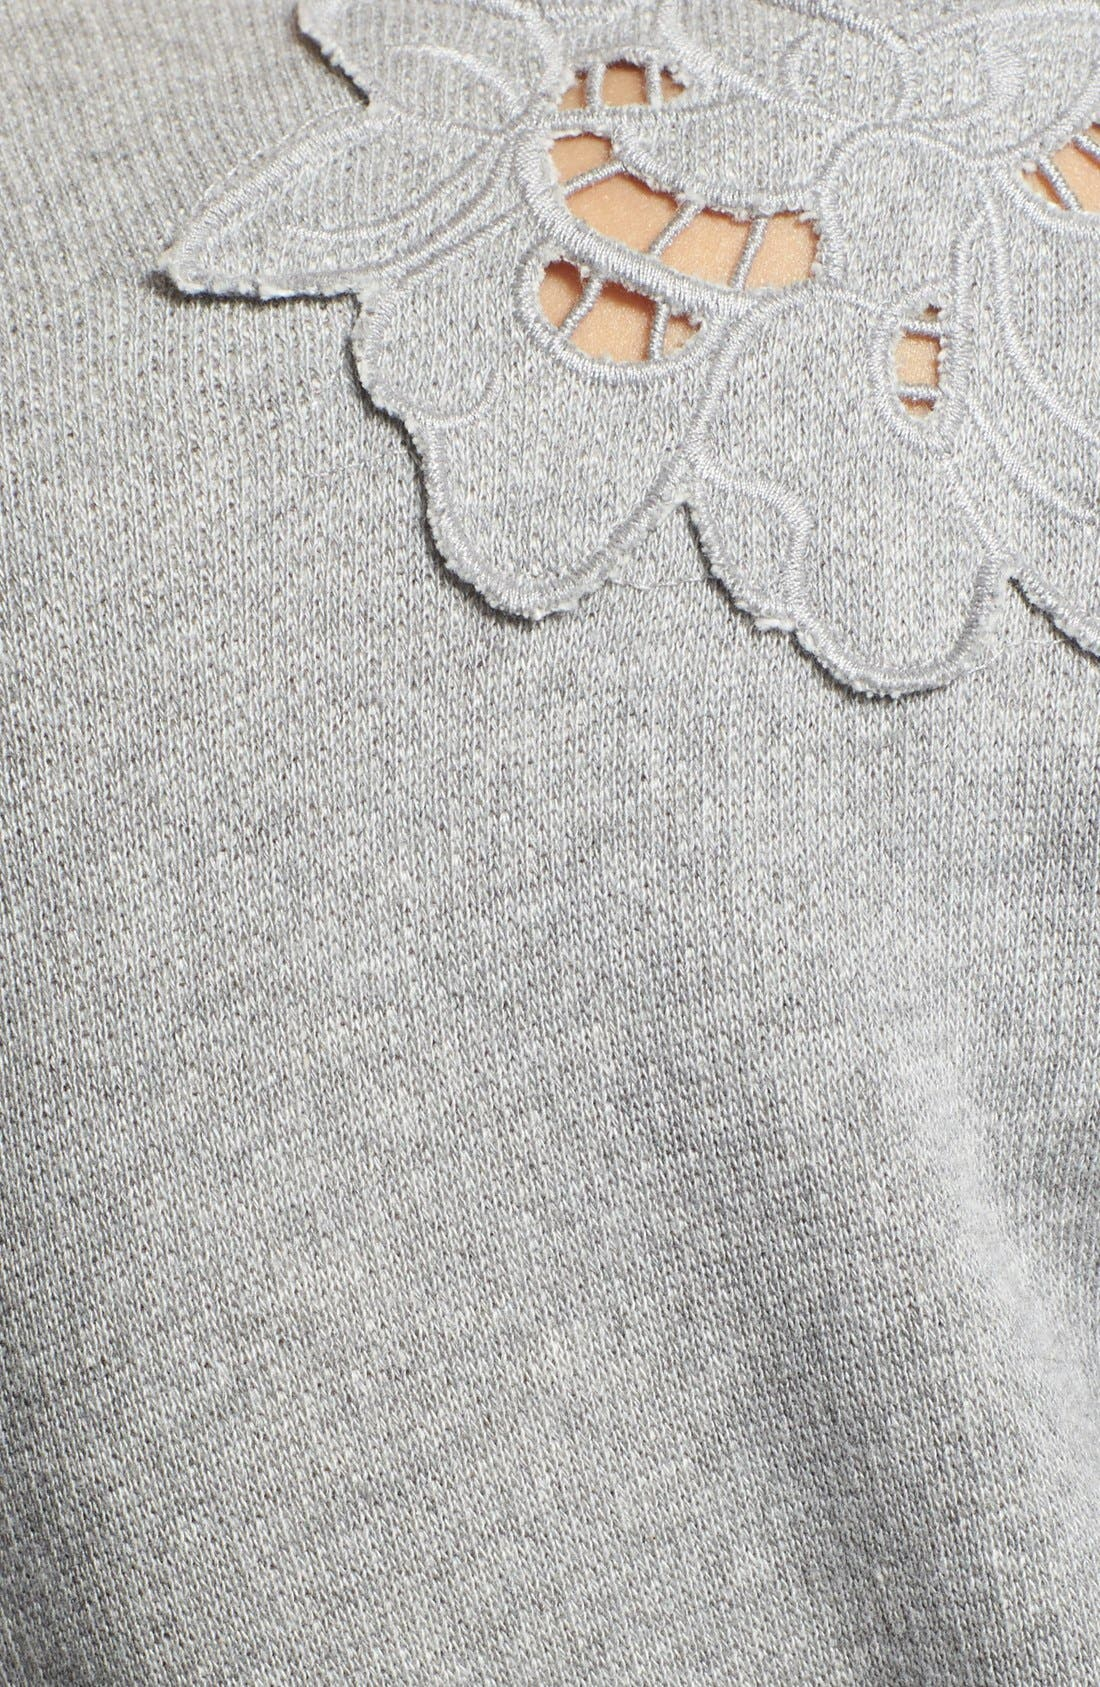 Alternate Image 3  - Rebecca Taylor Floral Cutout Crop Sweatshirt